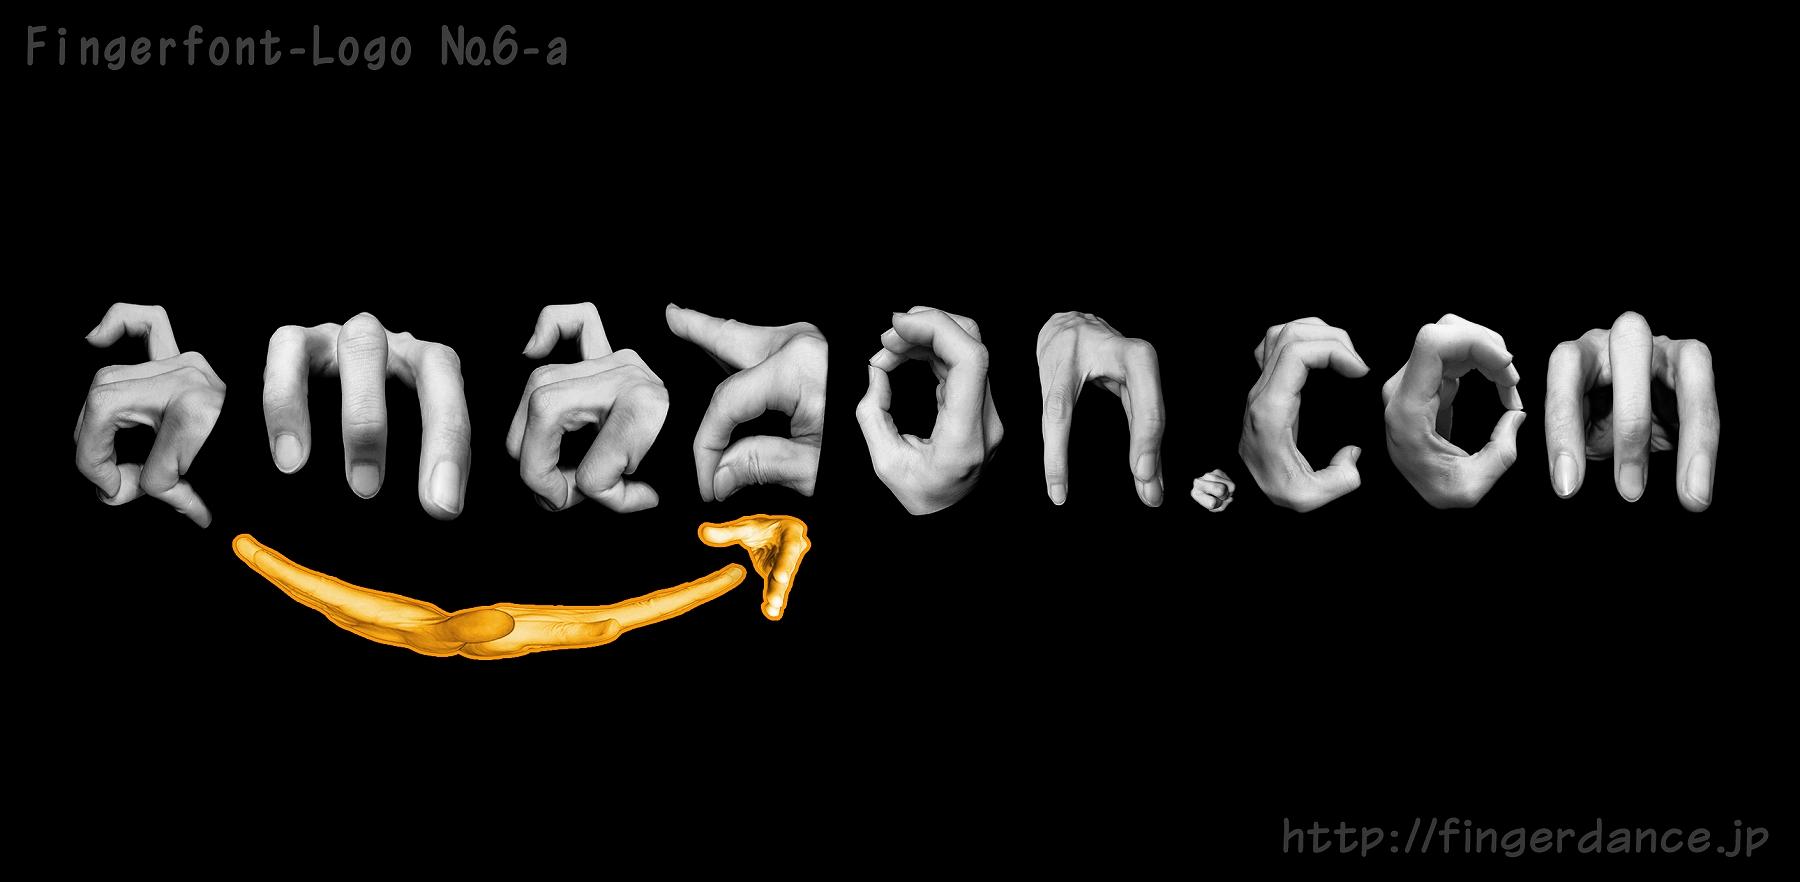 amazon.com-fingerlogohand アマゾン・フィンガーロゴハンド手指